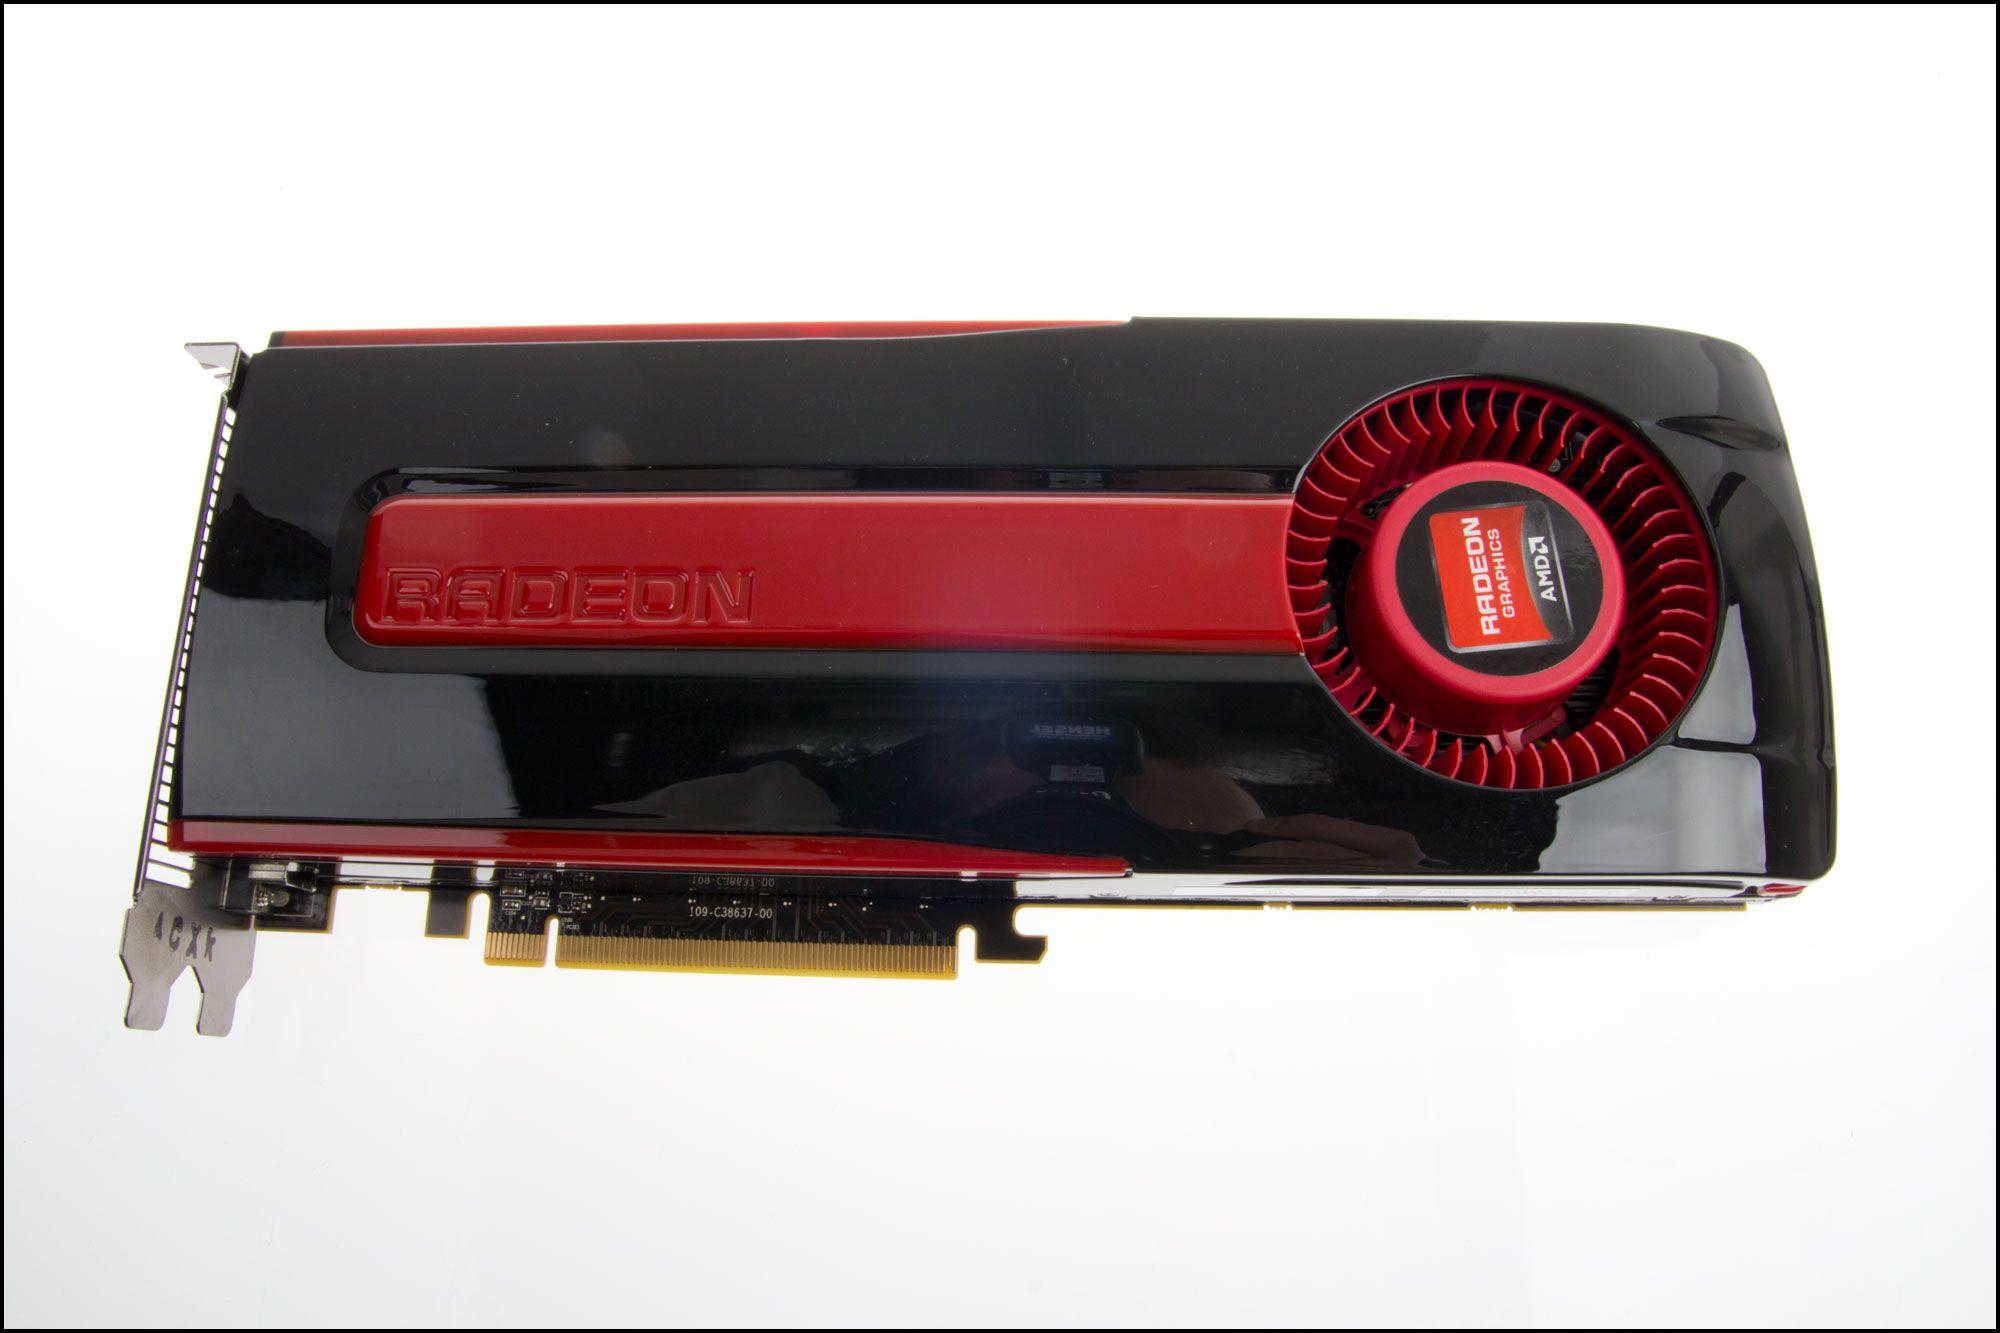 Referanseversjonen av Radeon HD 7950..